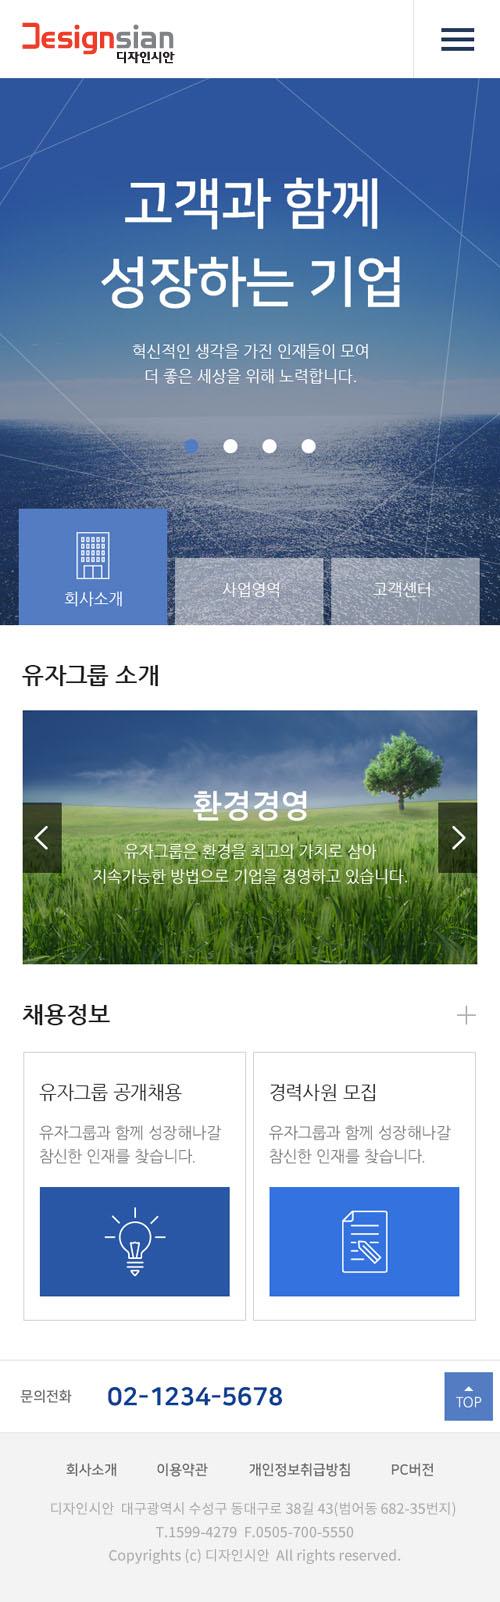 MOBILE - 시안번호 20368102